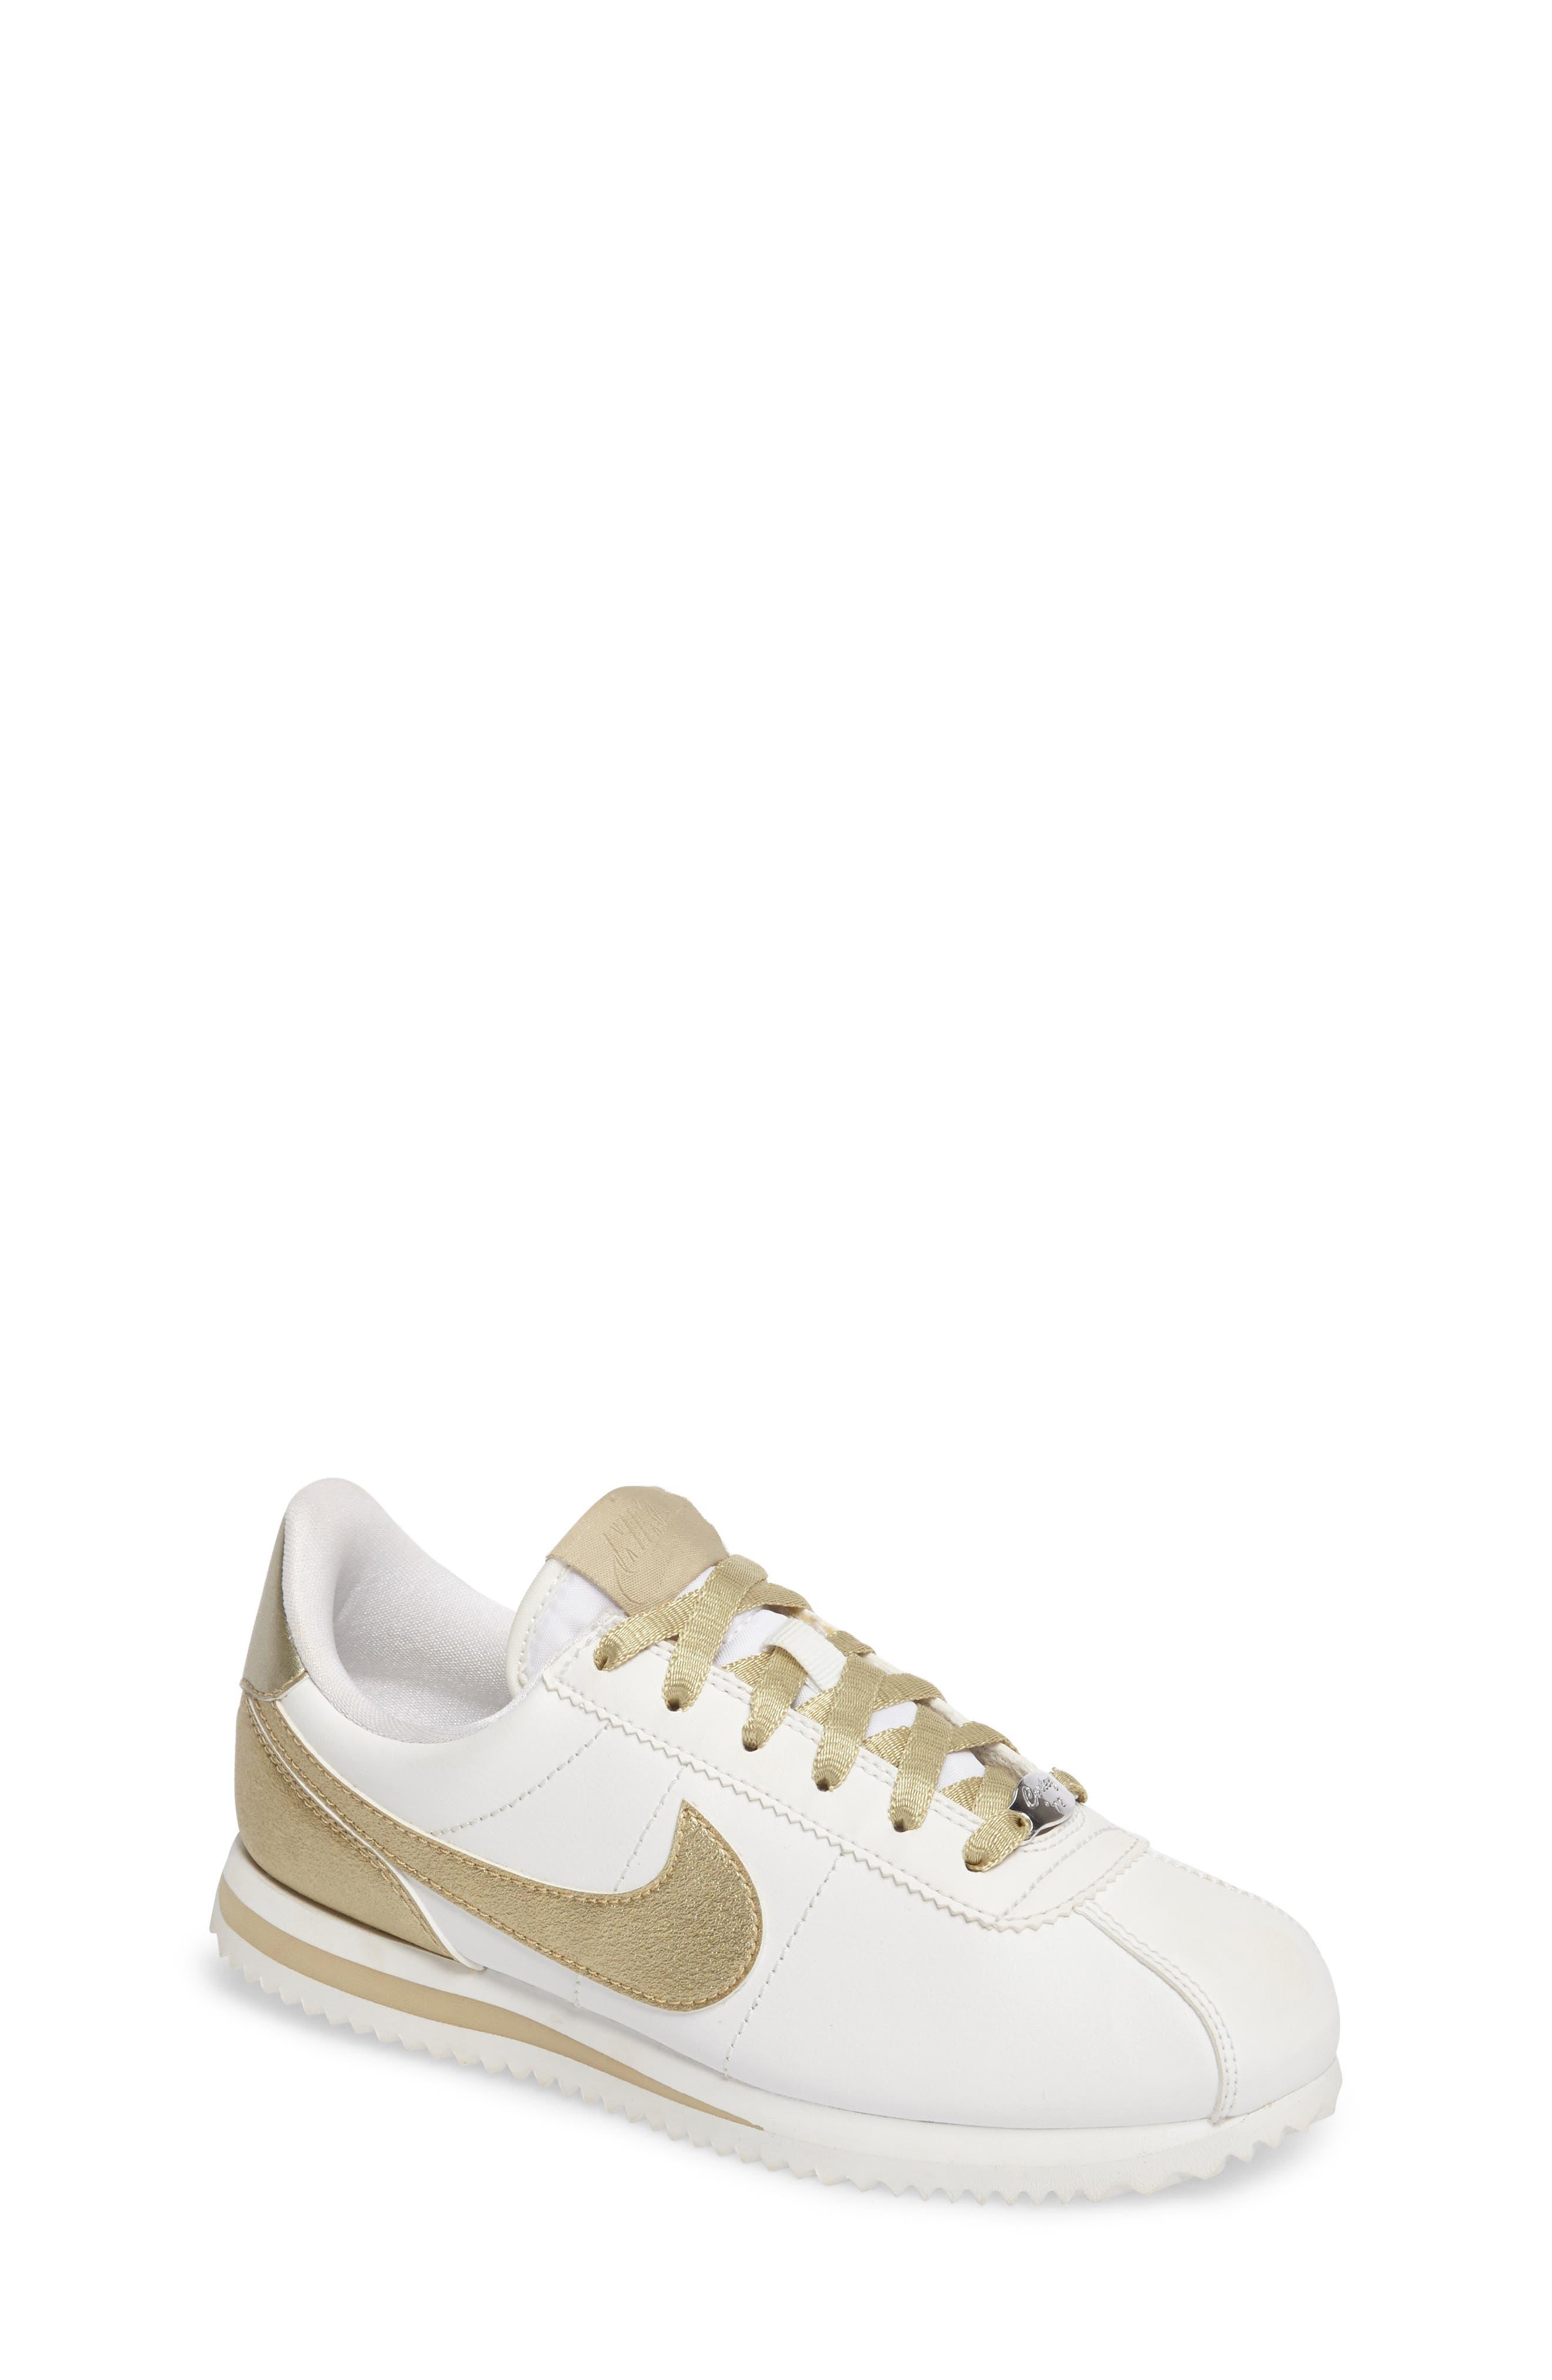 Cortez Basic SE Sneaker,                             Main thumbnail 1, color,                             101